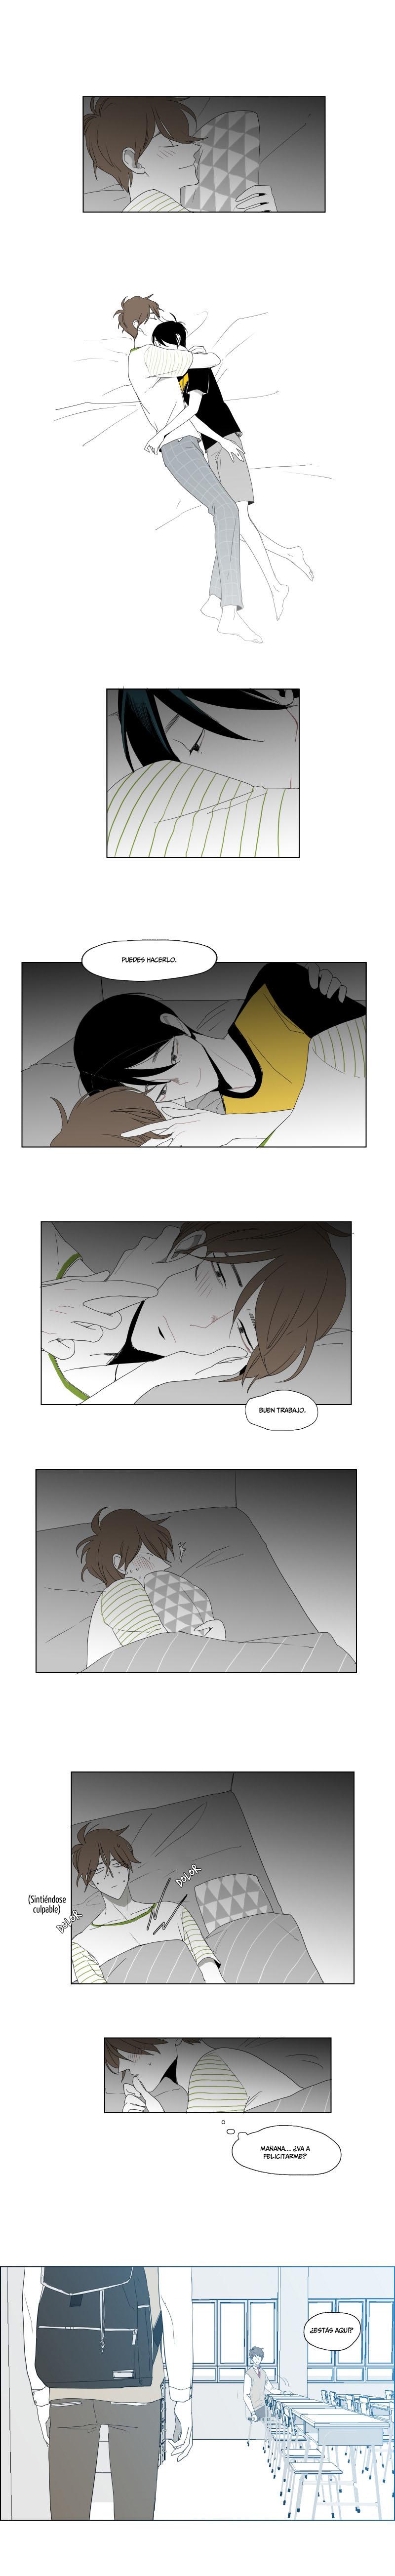 Manga Bagjwi Sayug -Raising a Bat- cápitulo 12 página 000a_214631.jpg